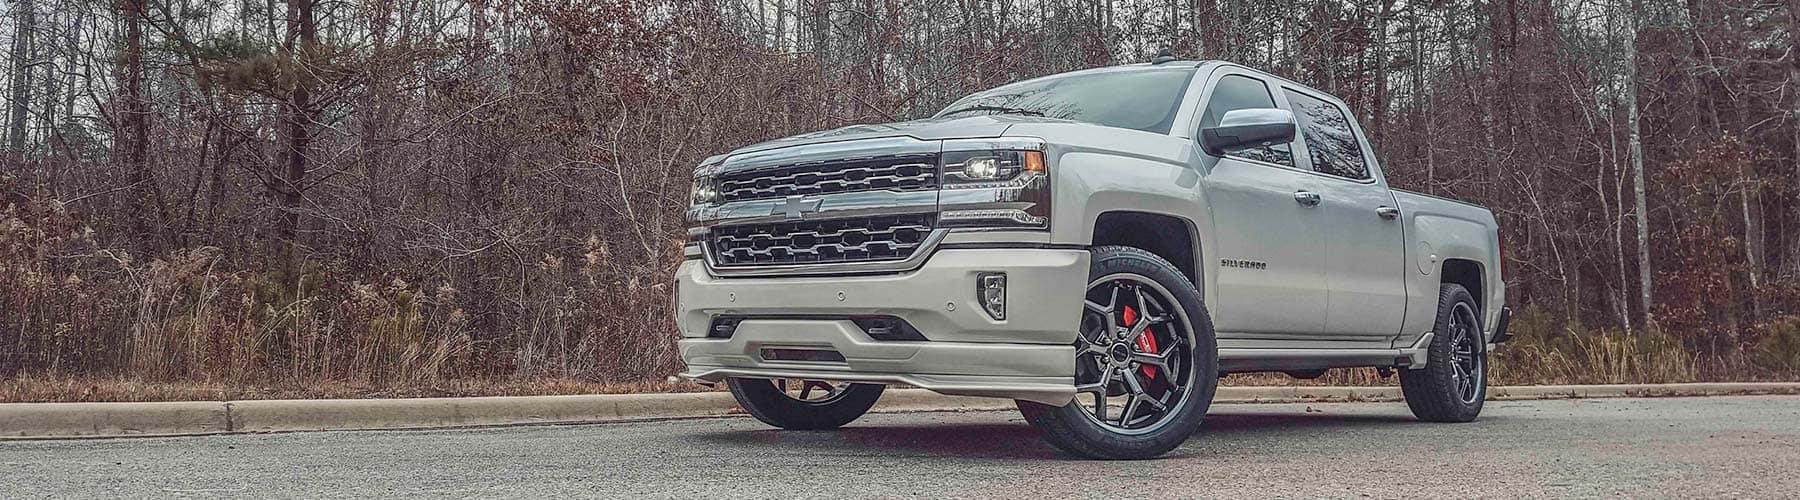 sca performance trucks suvs chevy